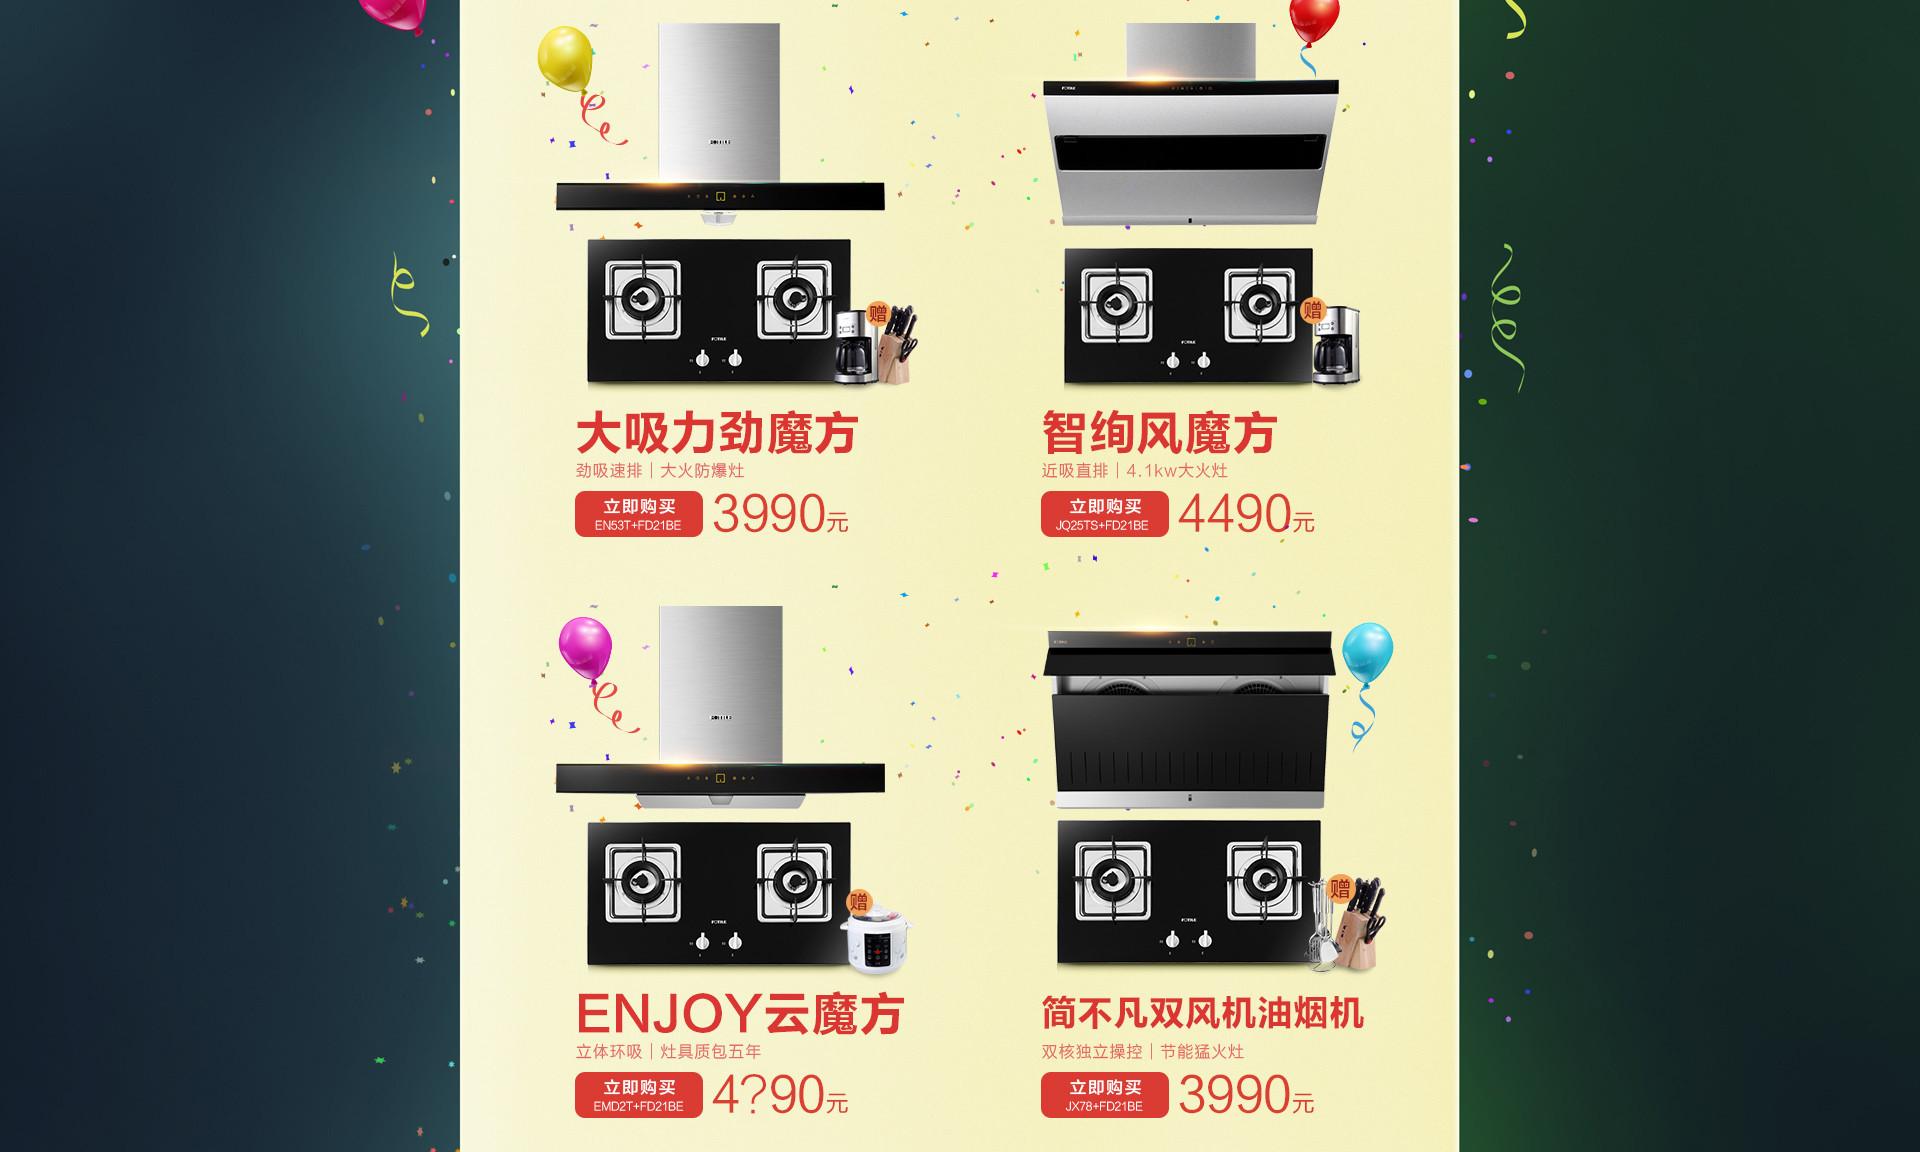 http://image.suning.cn/uimg/sop/commodity/191775843018875831285785_x.jpg